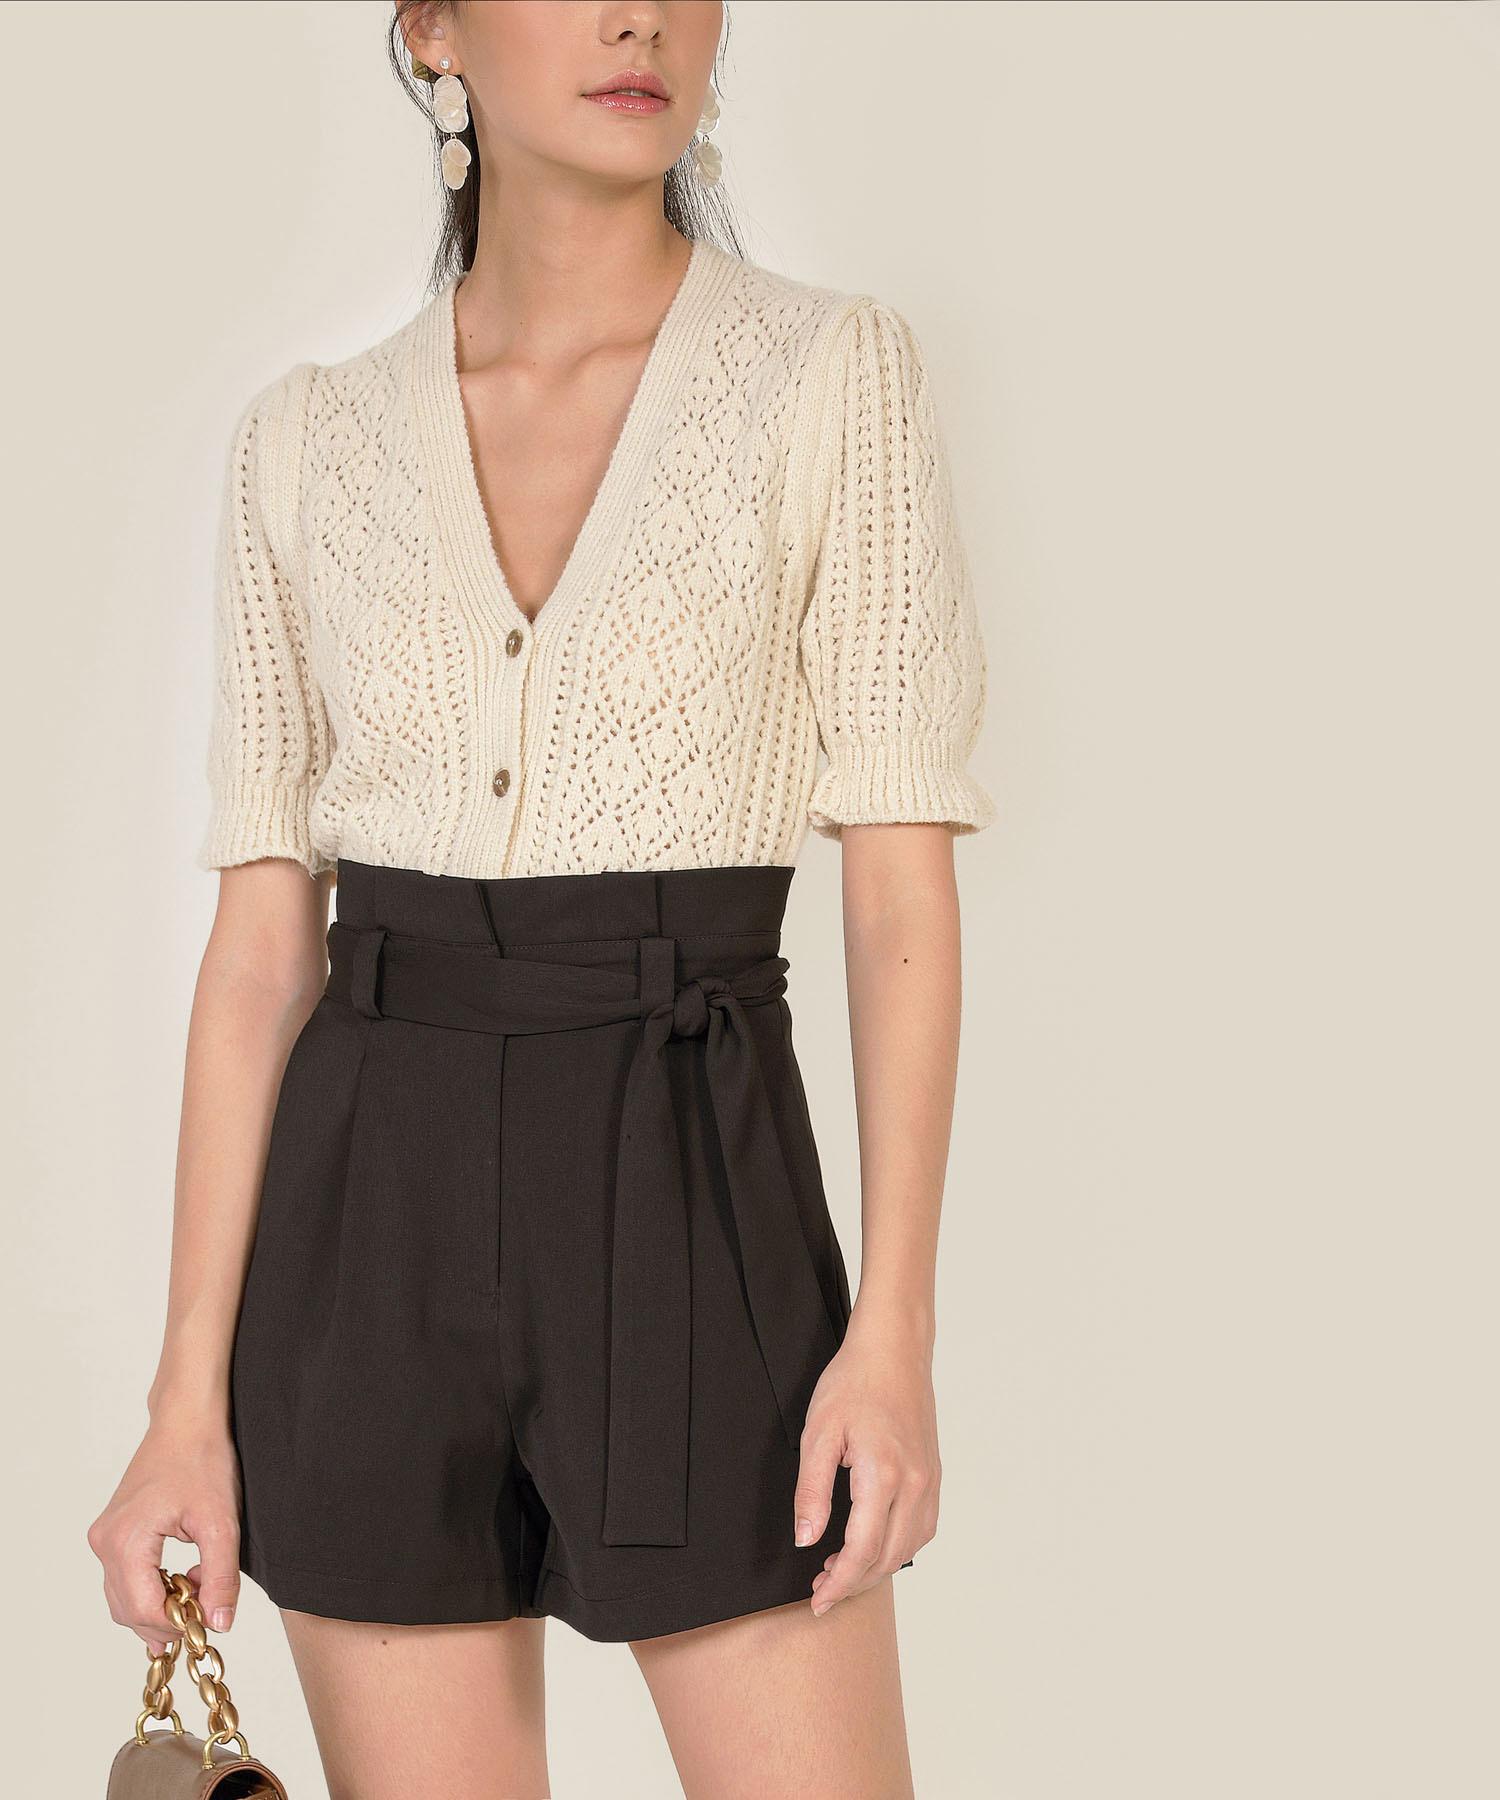 franca-paperbag-shorts-black-1